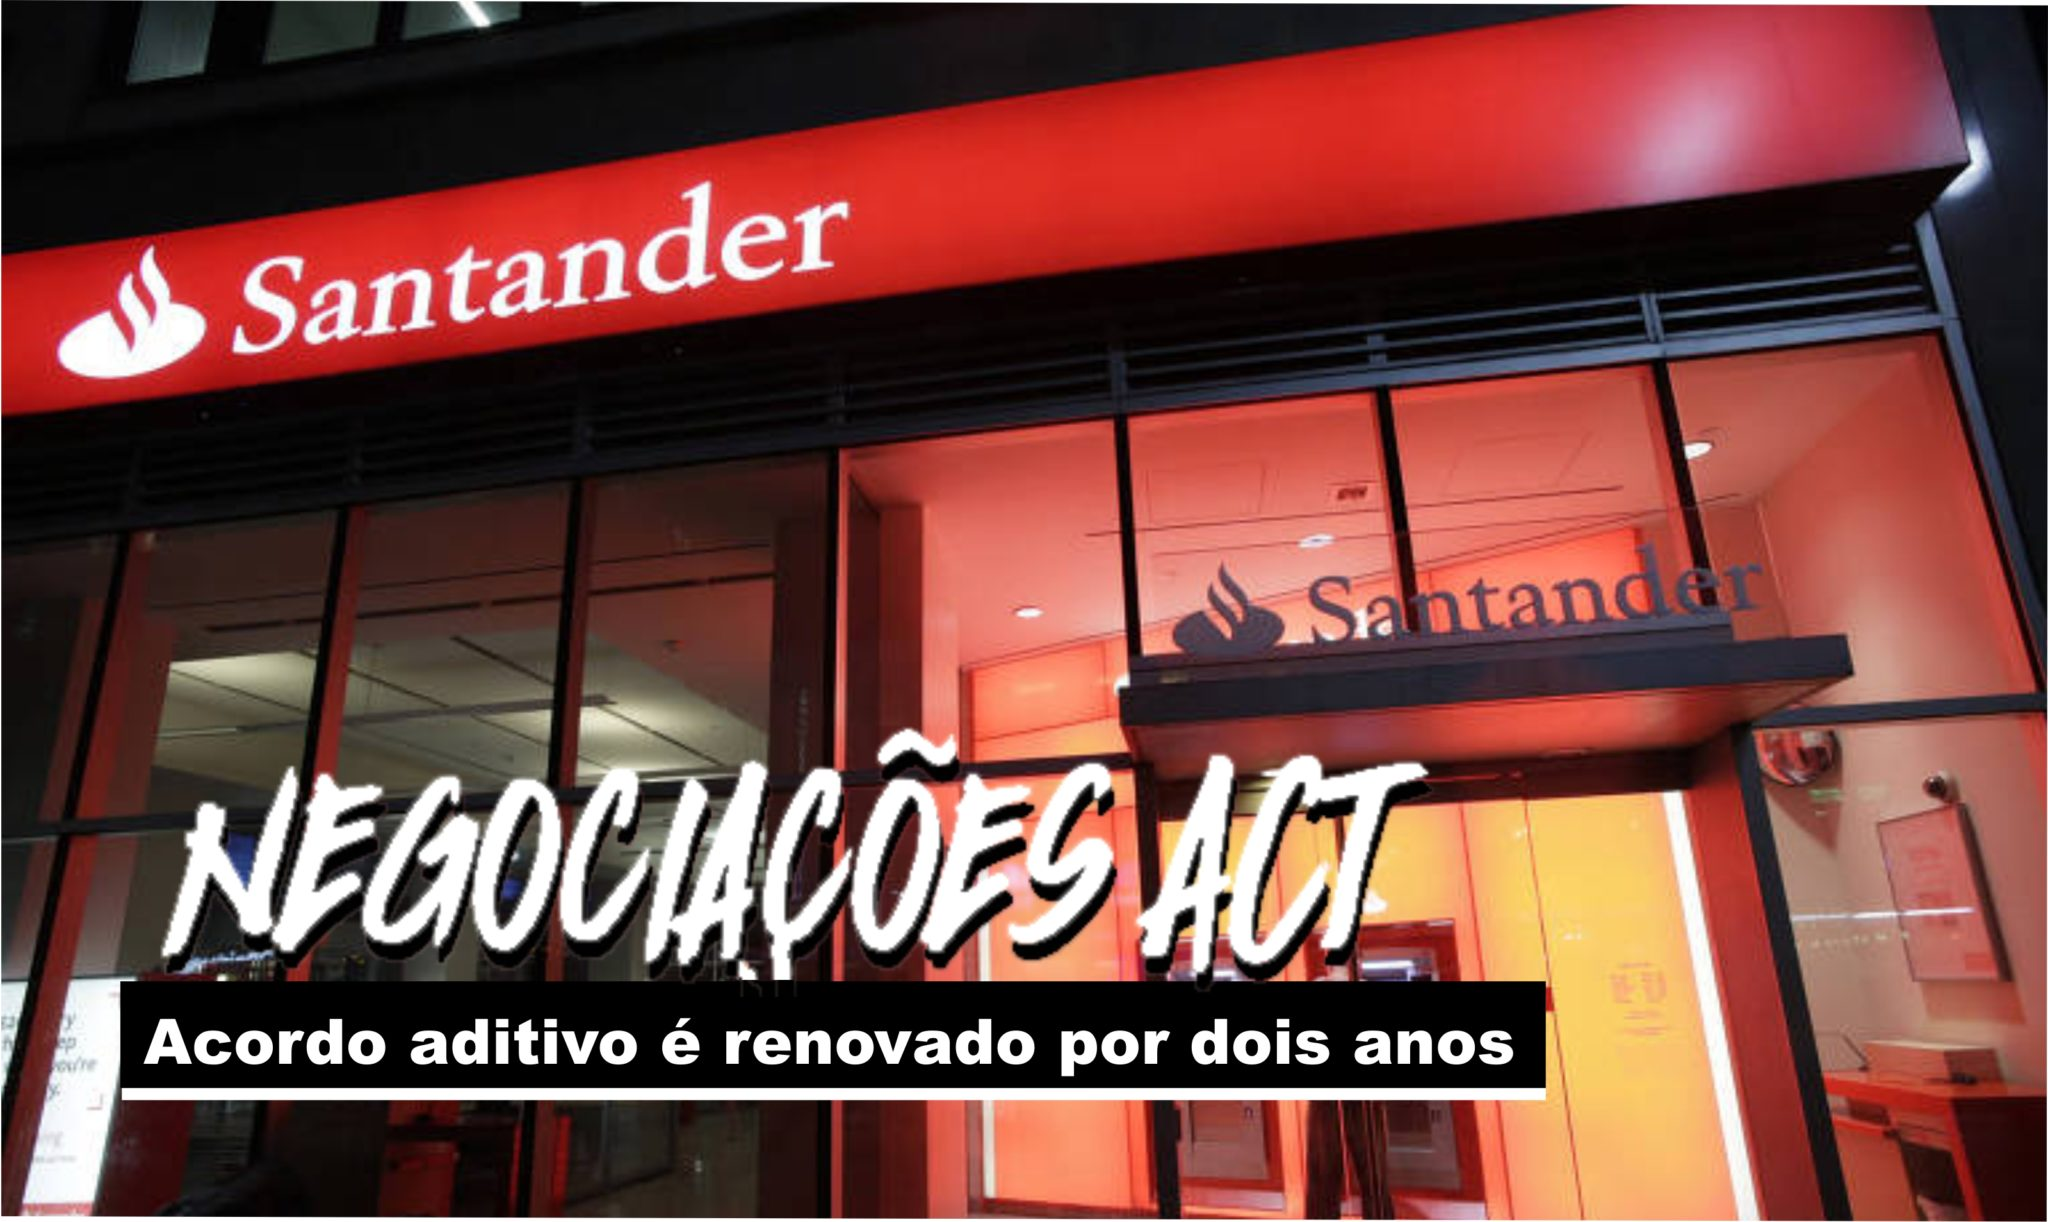 5negociacoes-act-santander-2048x1222.jpg